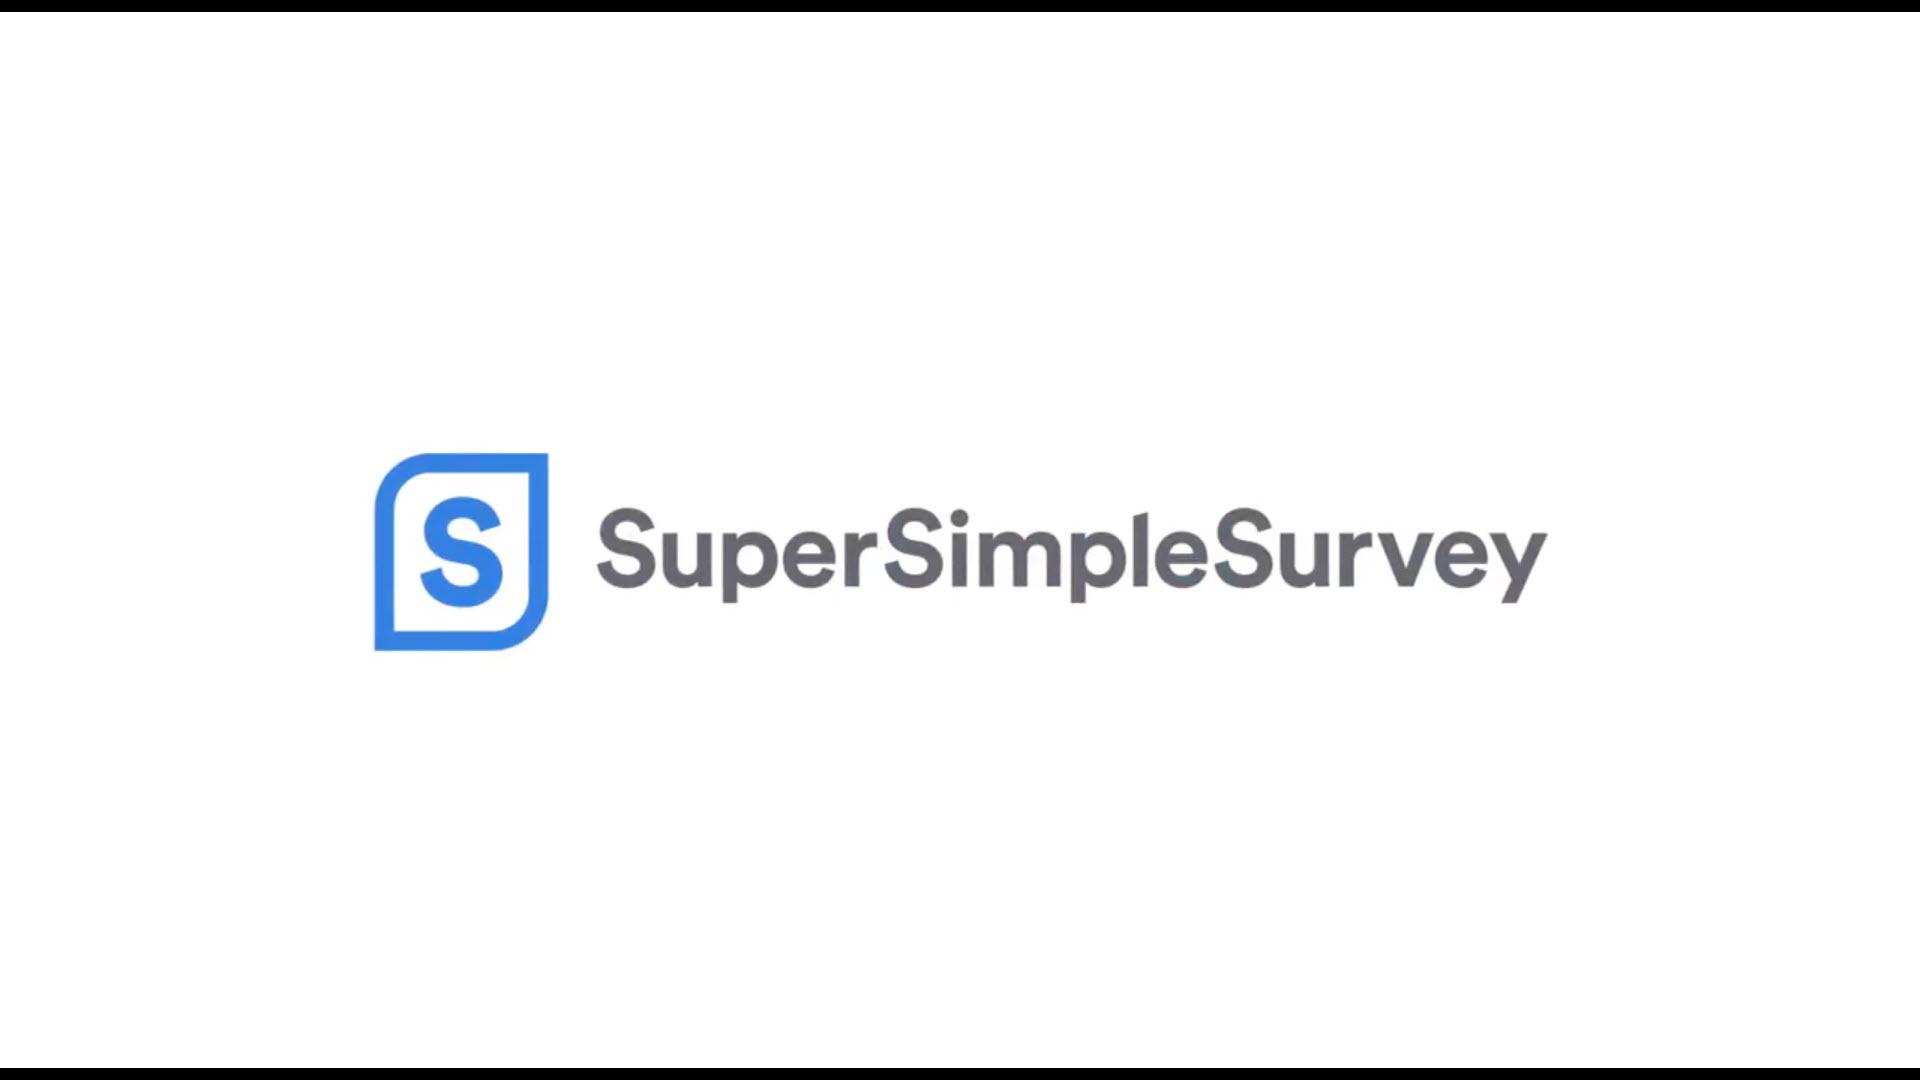 SuperSimpleSurvey